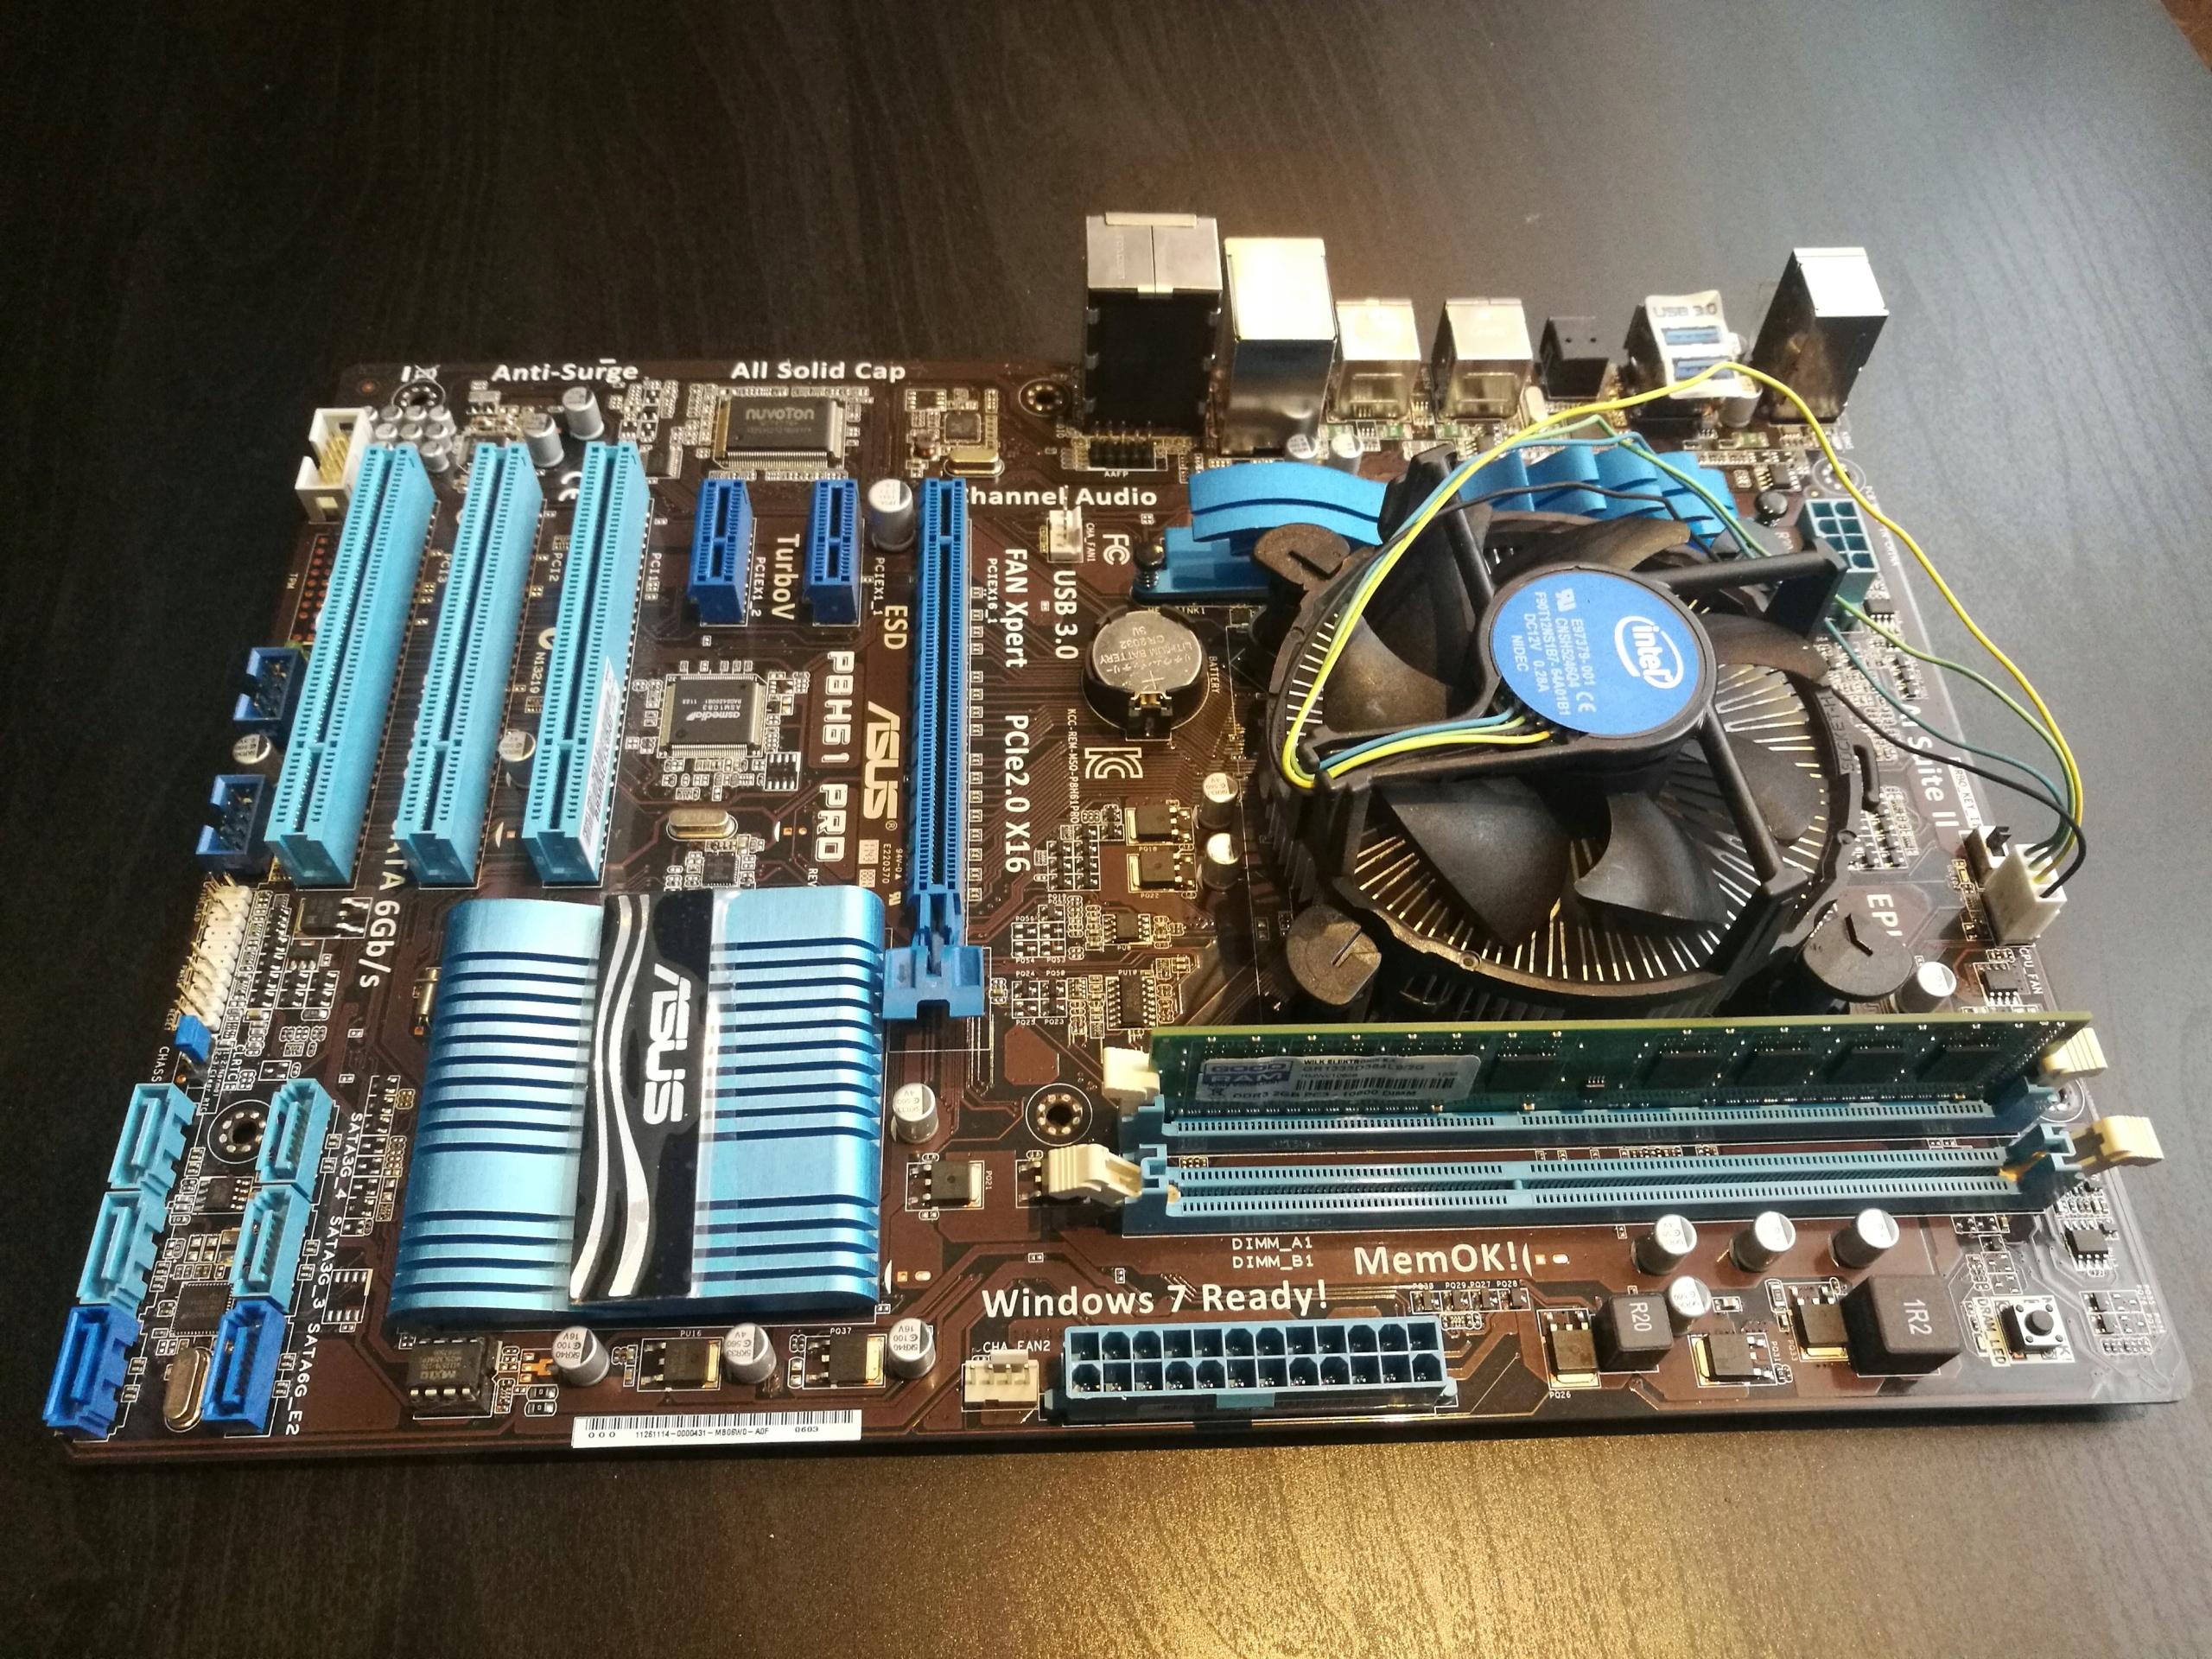 Asus P8H61 Pro, Intel Core i3 - 2120, Ram 2GB